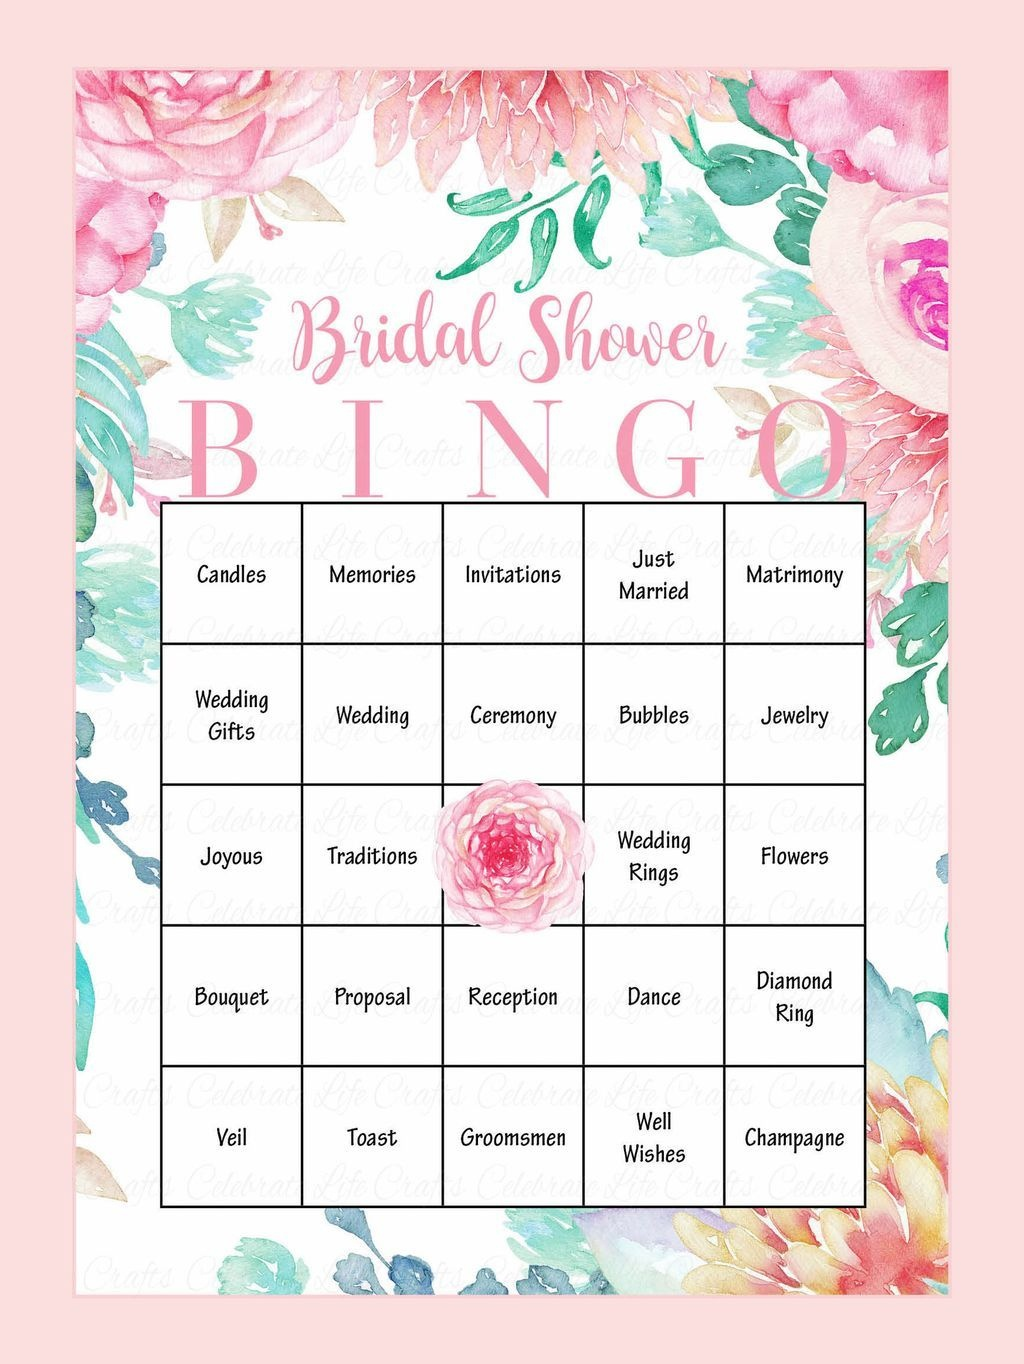 10 Printable Bridal Shower Games You Can Diy   Wedding Ideas - Free Printable Bridal Shower Blank Bingo Games